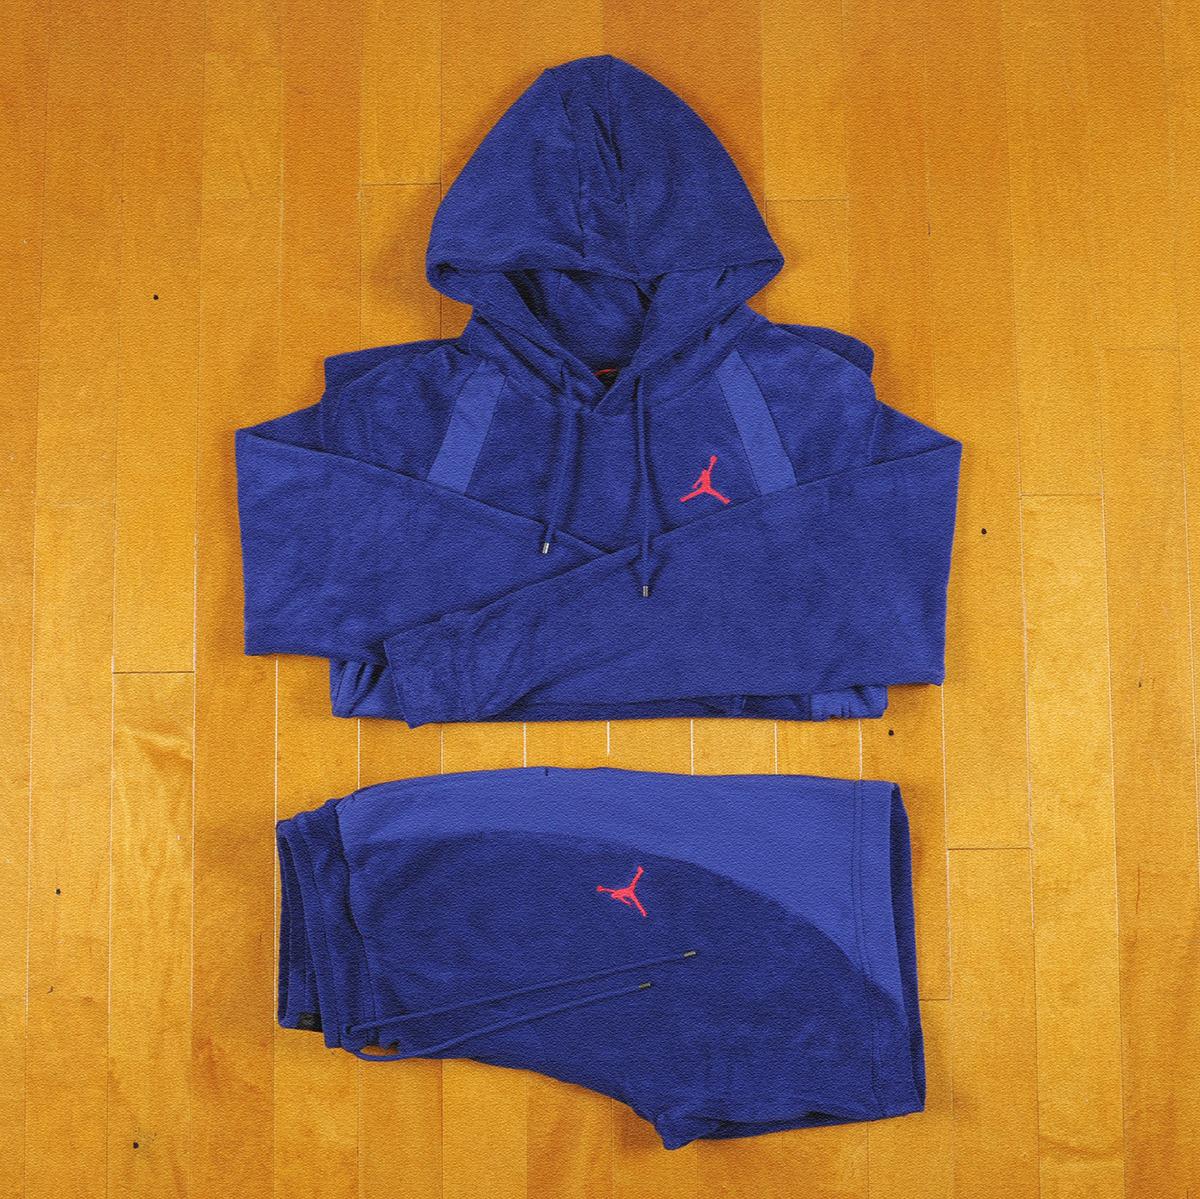 jordan-10-westbrook-shorts-hoodie-match